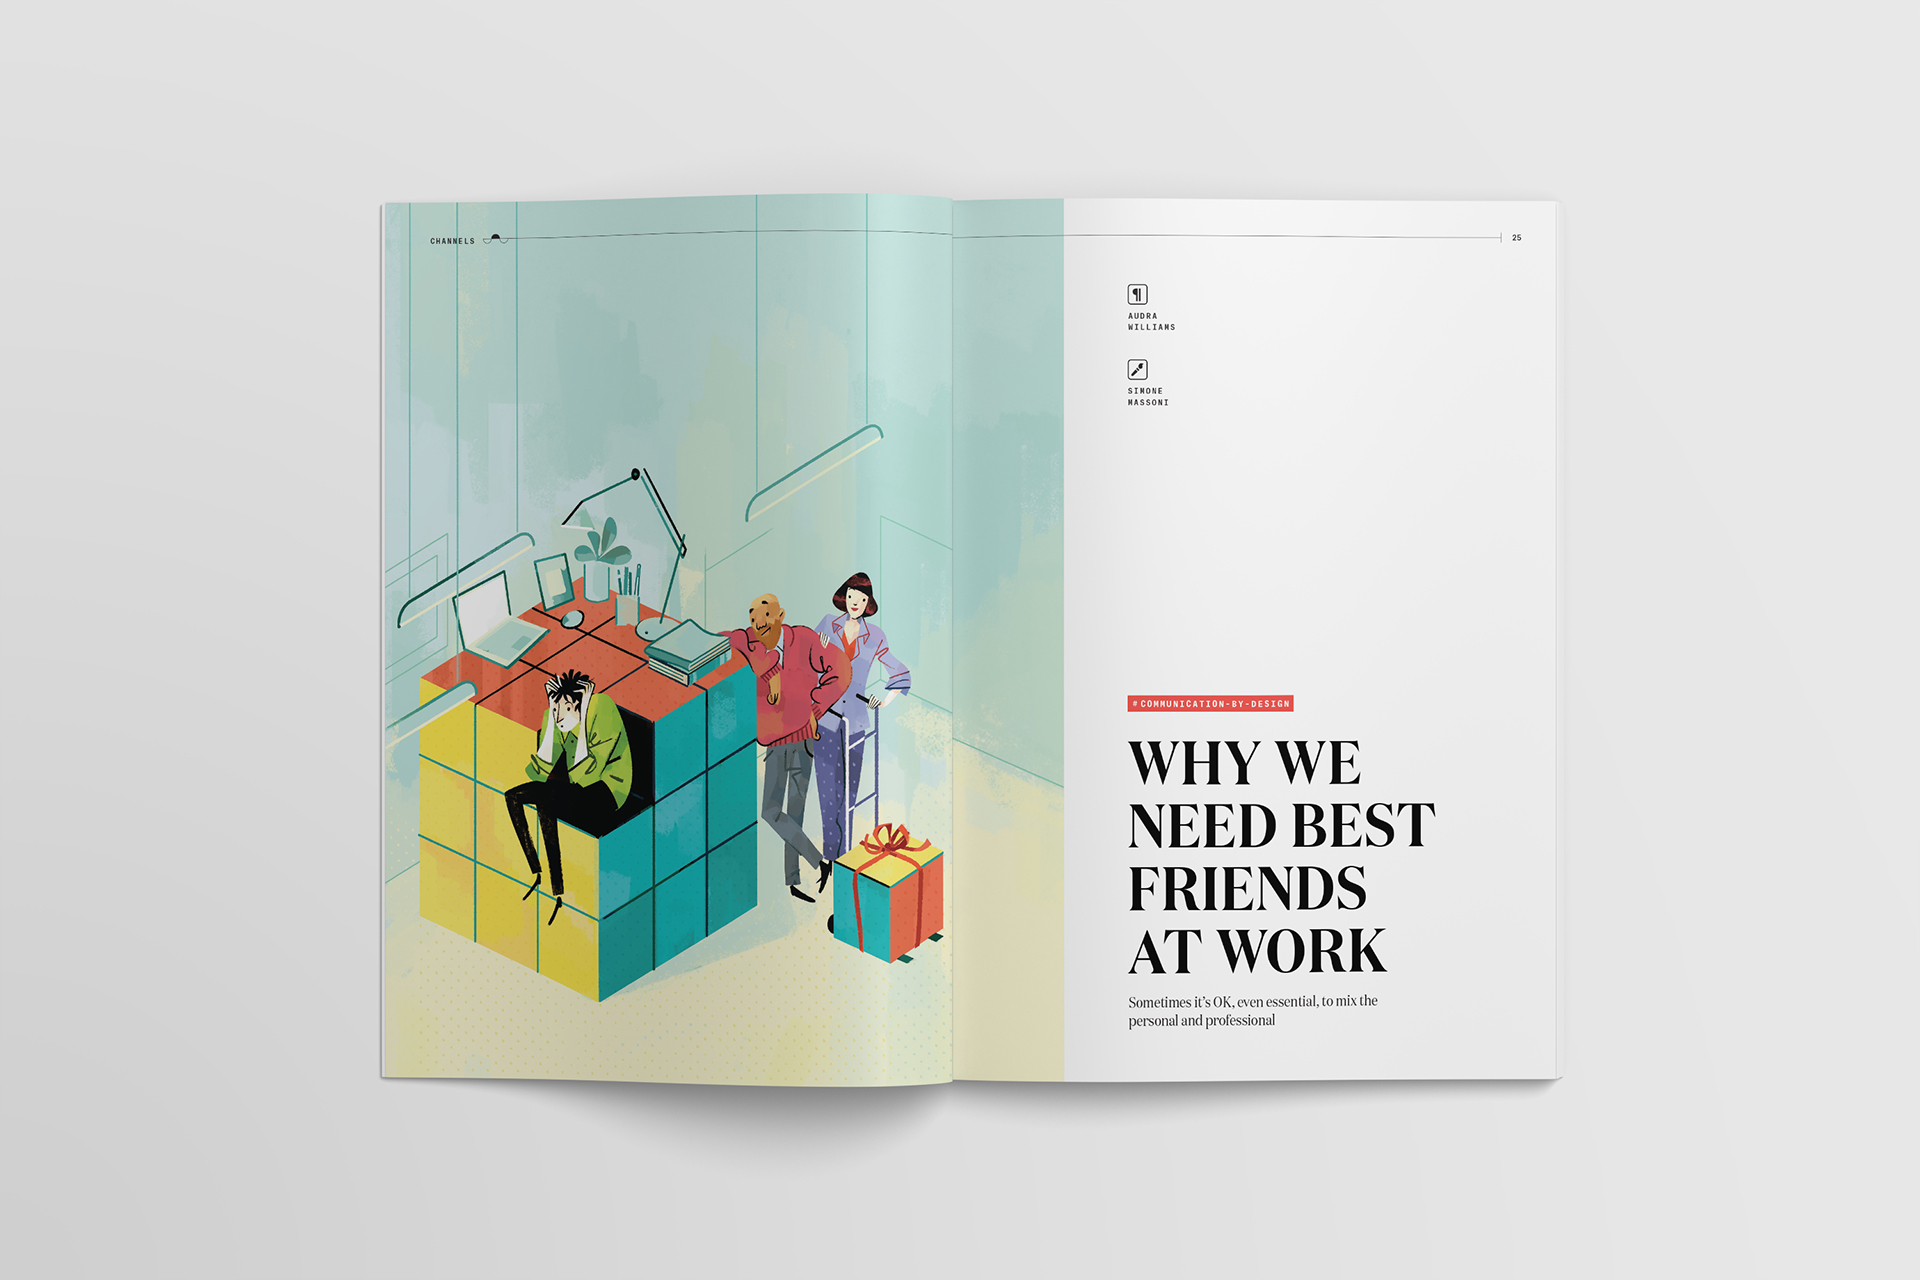 Simone Massoni's Best Friends at Work illustration for Slack's Channels magazine